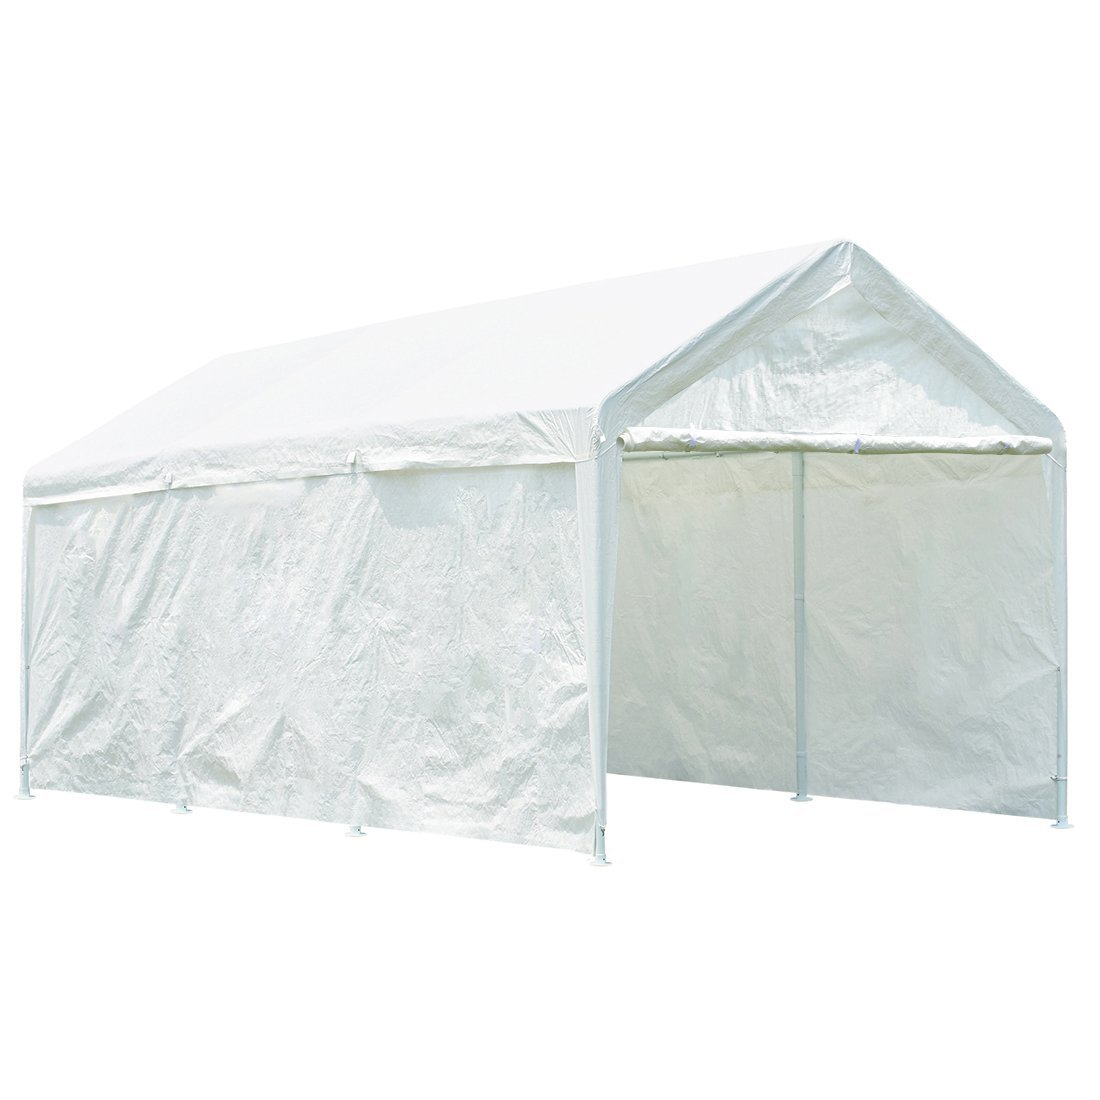 Quictent 20u0027 x 10u0027 Heavy Duty Carport Gazebo Canopy Party Tent Garage Car Shelter White - Walmart.com  sc 1 st  Walmart & Quictent 20u0027 x 10u0027 Heavy Duty Carport Gazebo Canopy Party Tent ...